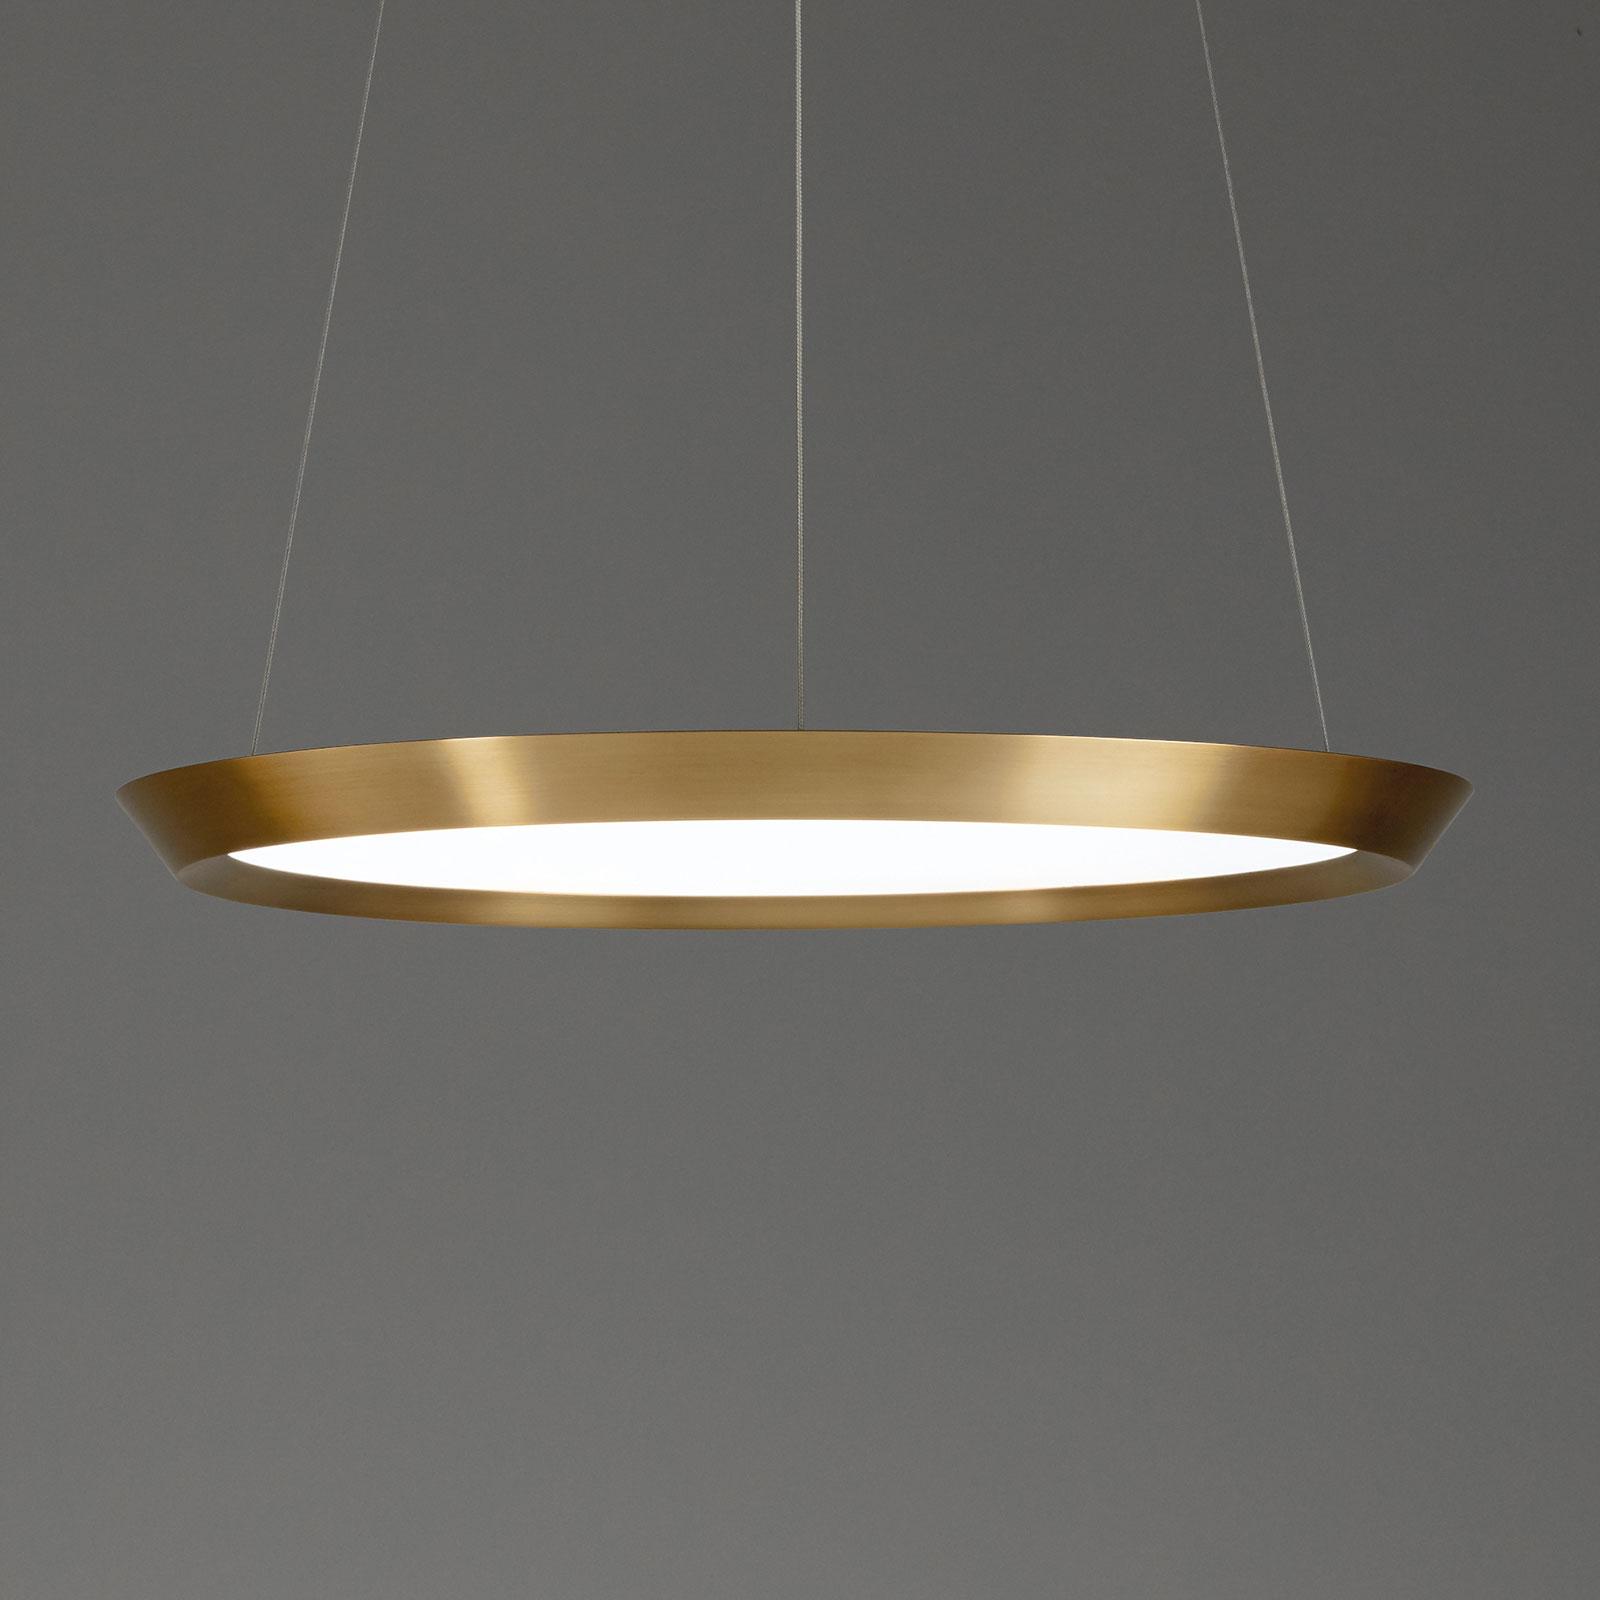 Grok Saturn LED hanglamp messing satijn, Ø 60 cm